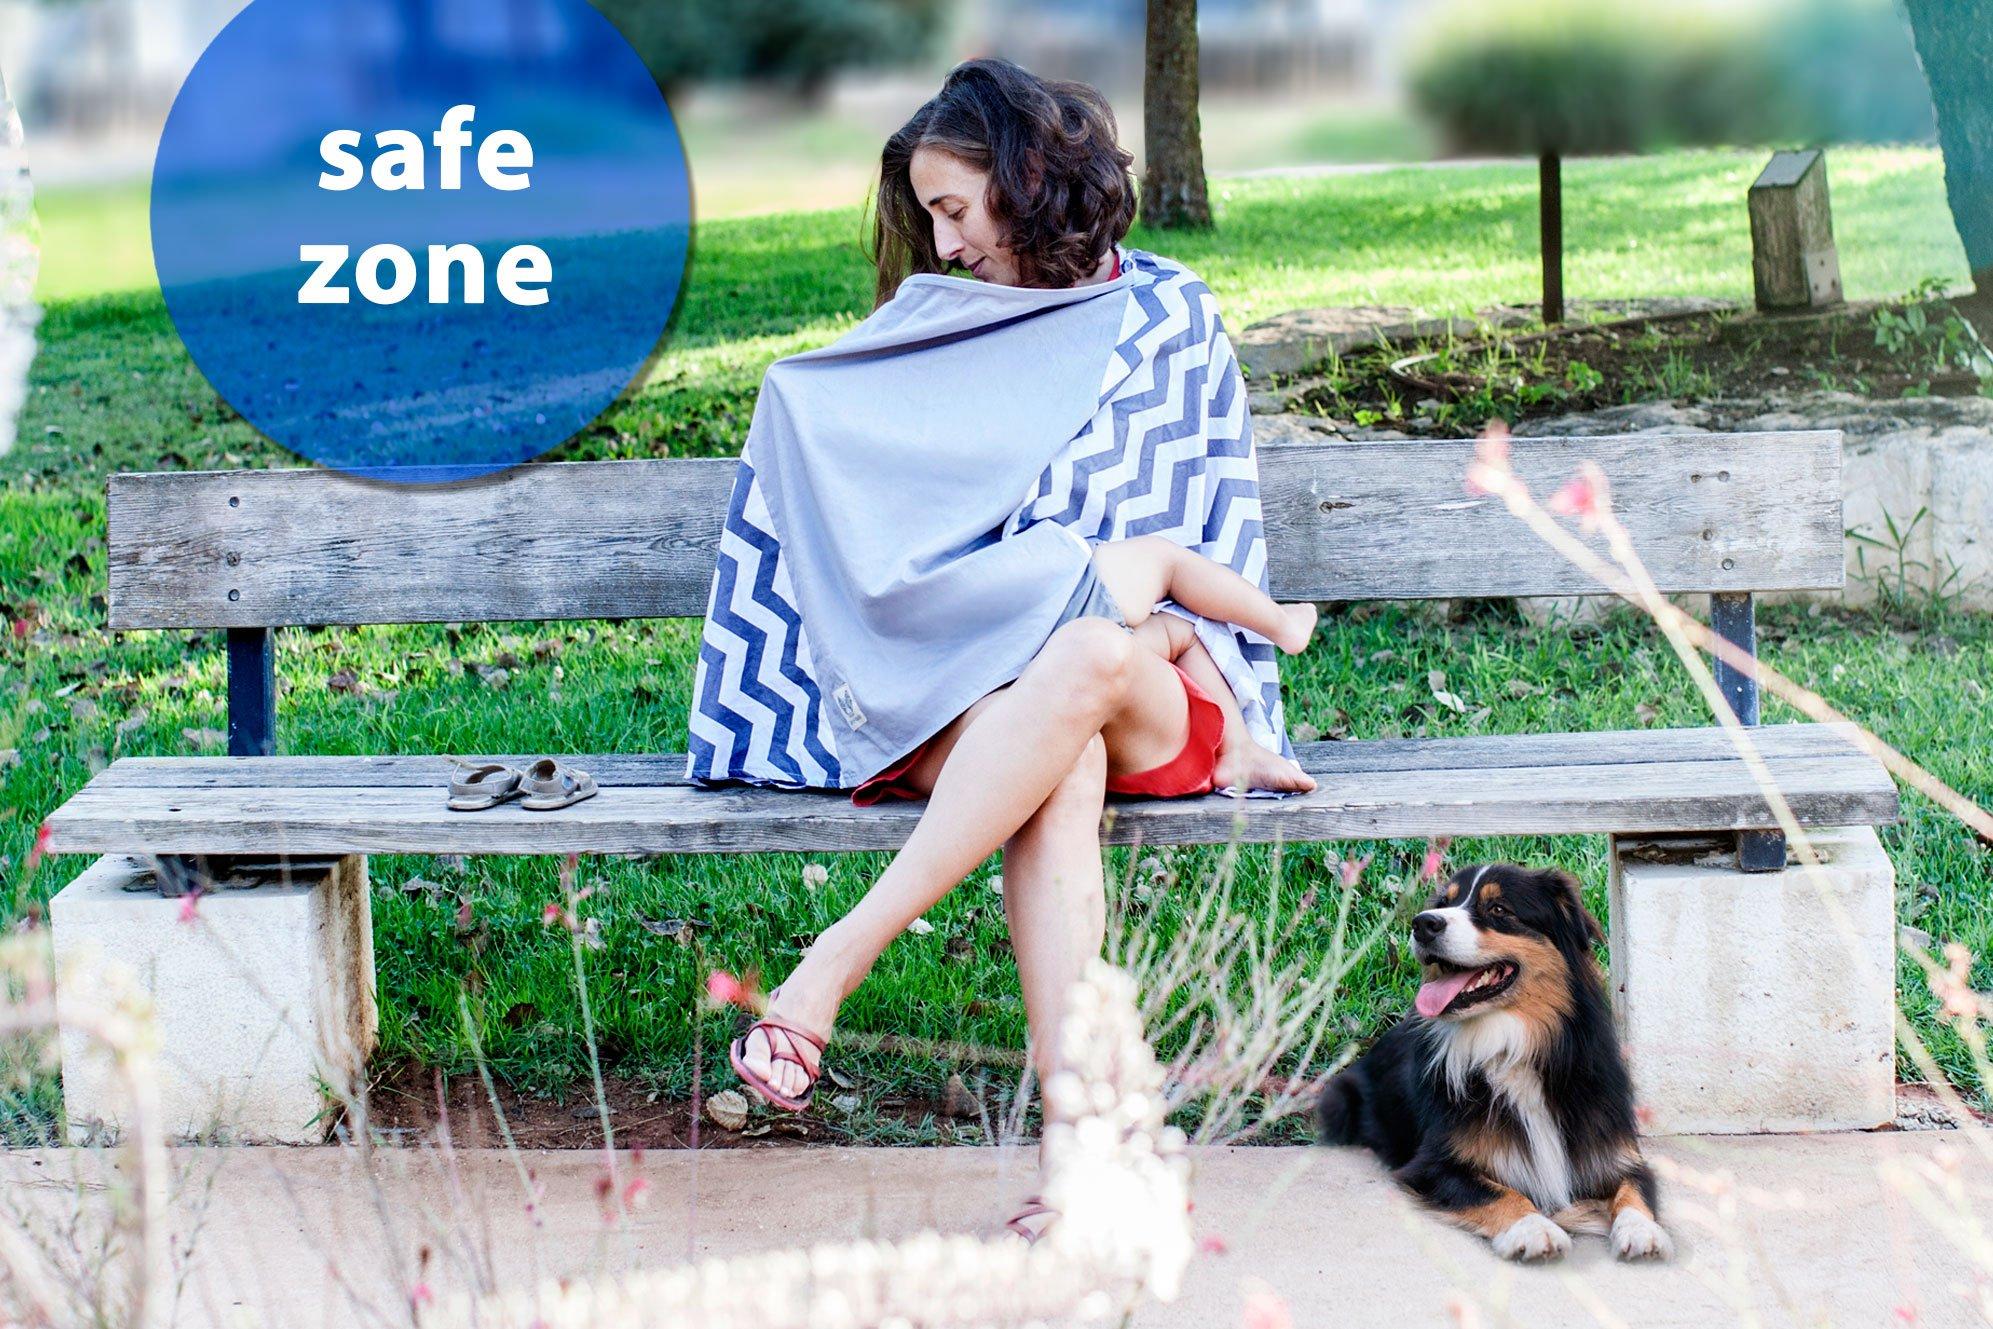 Fair-e-Trade Poncho Rigid Neckline Nursing Cover, 100% Premium Breathable Cotton by Fair-e-Trade (Image #8)